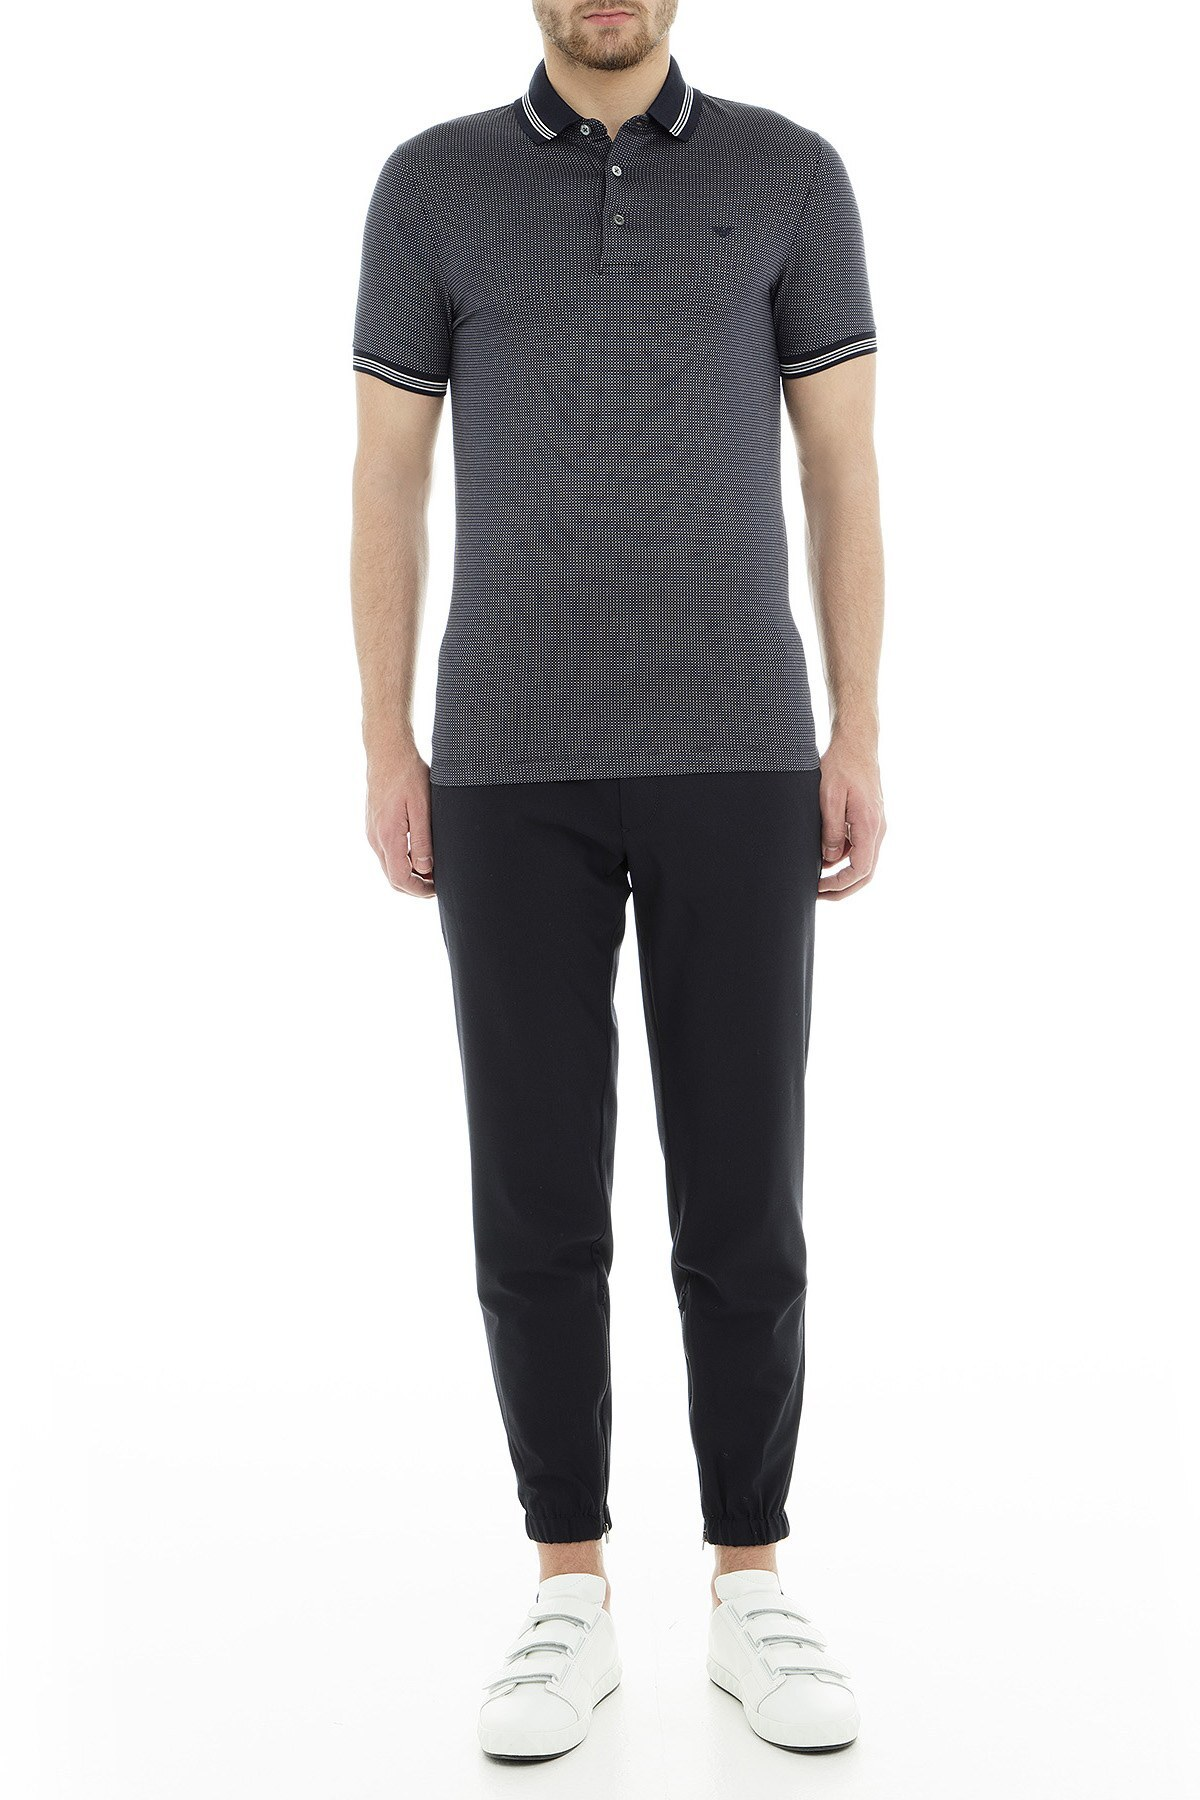 Emporio Armani Erkek T Shirt 6Z1FP3 1JTWZ F960 LACİVERT